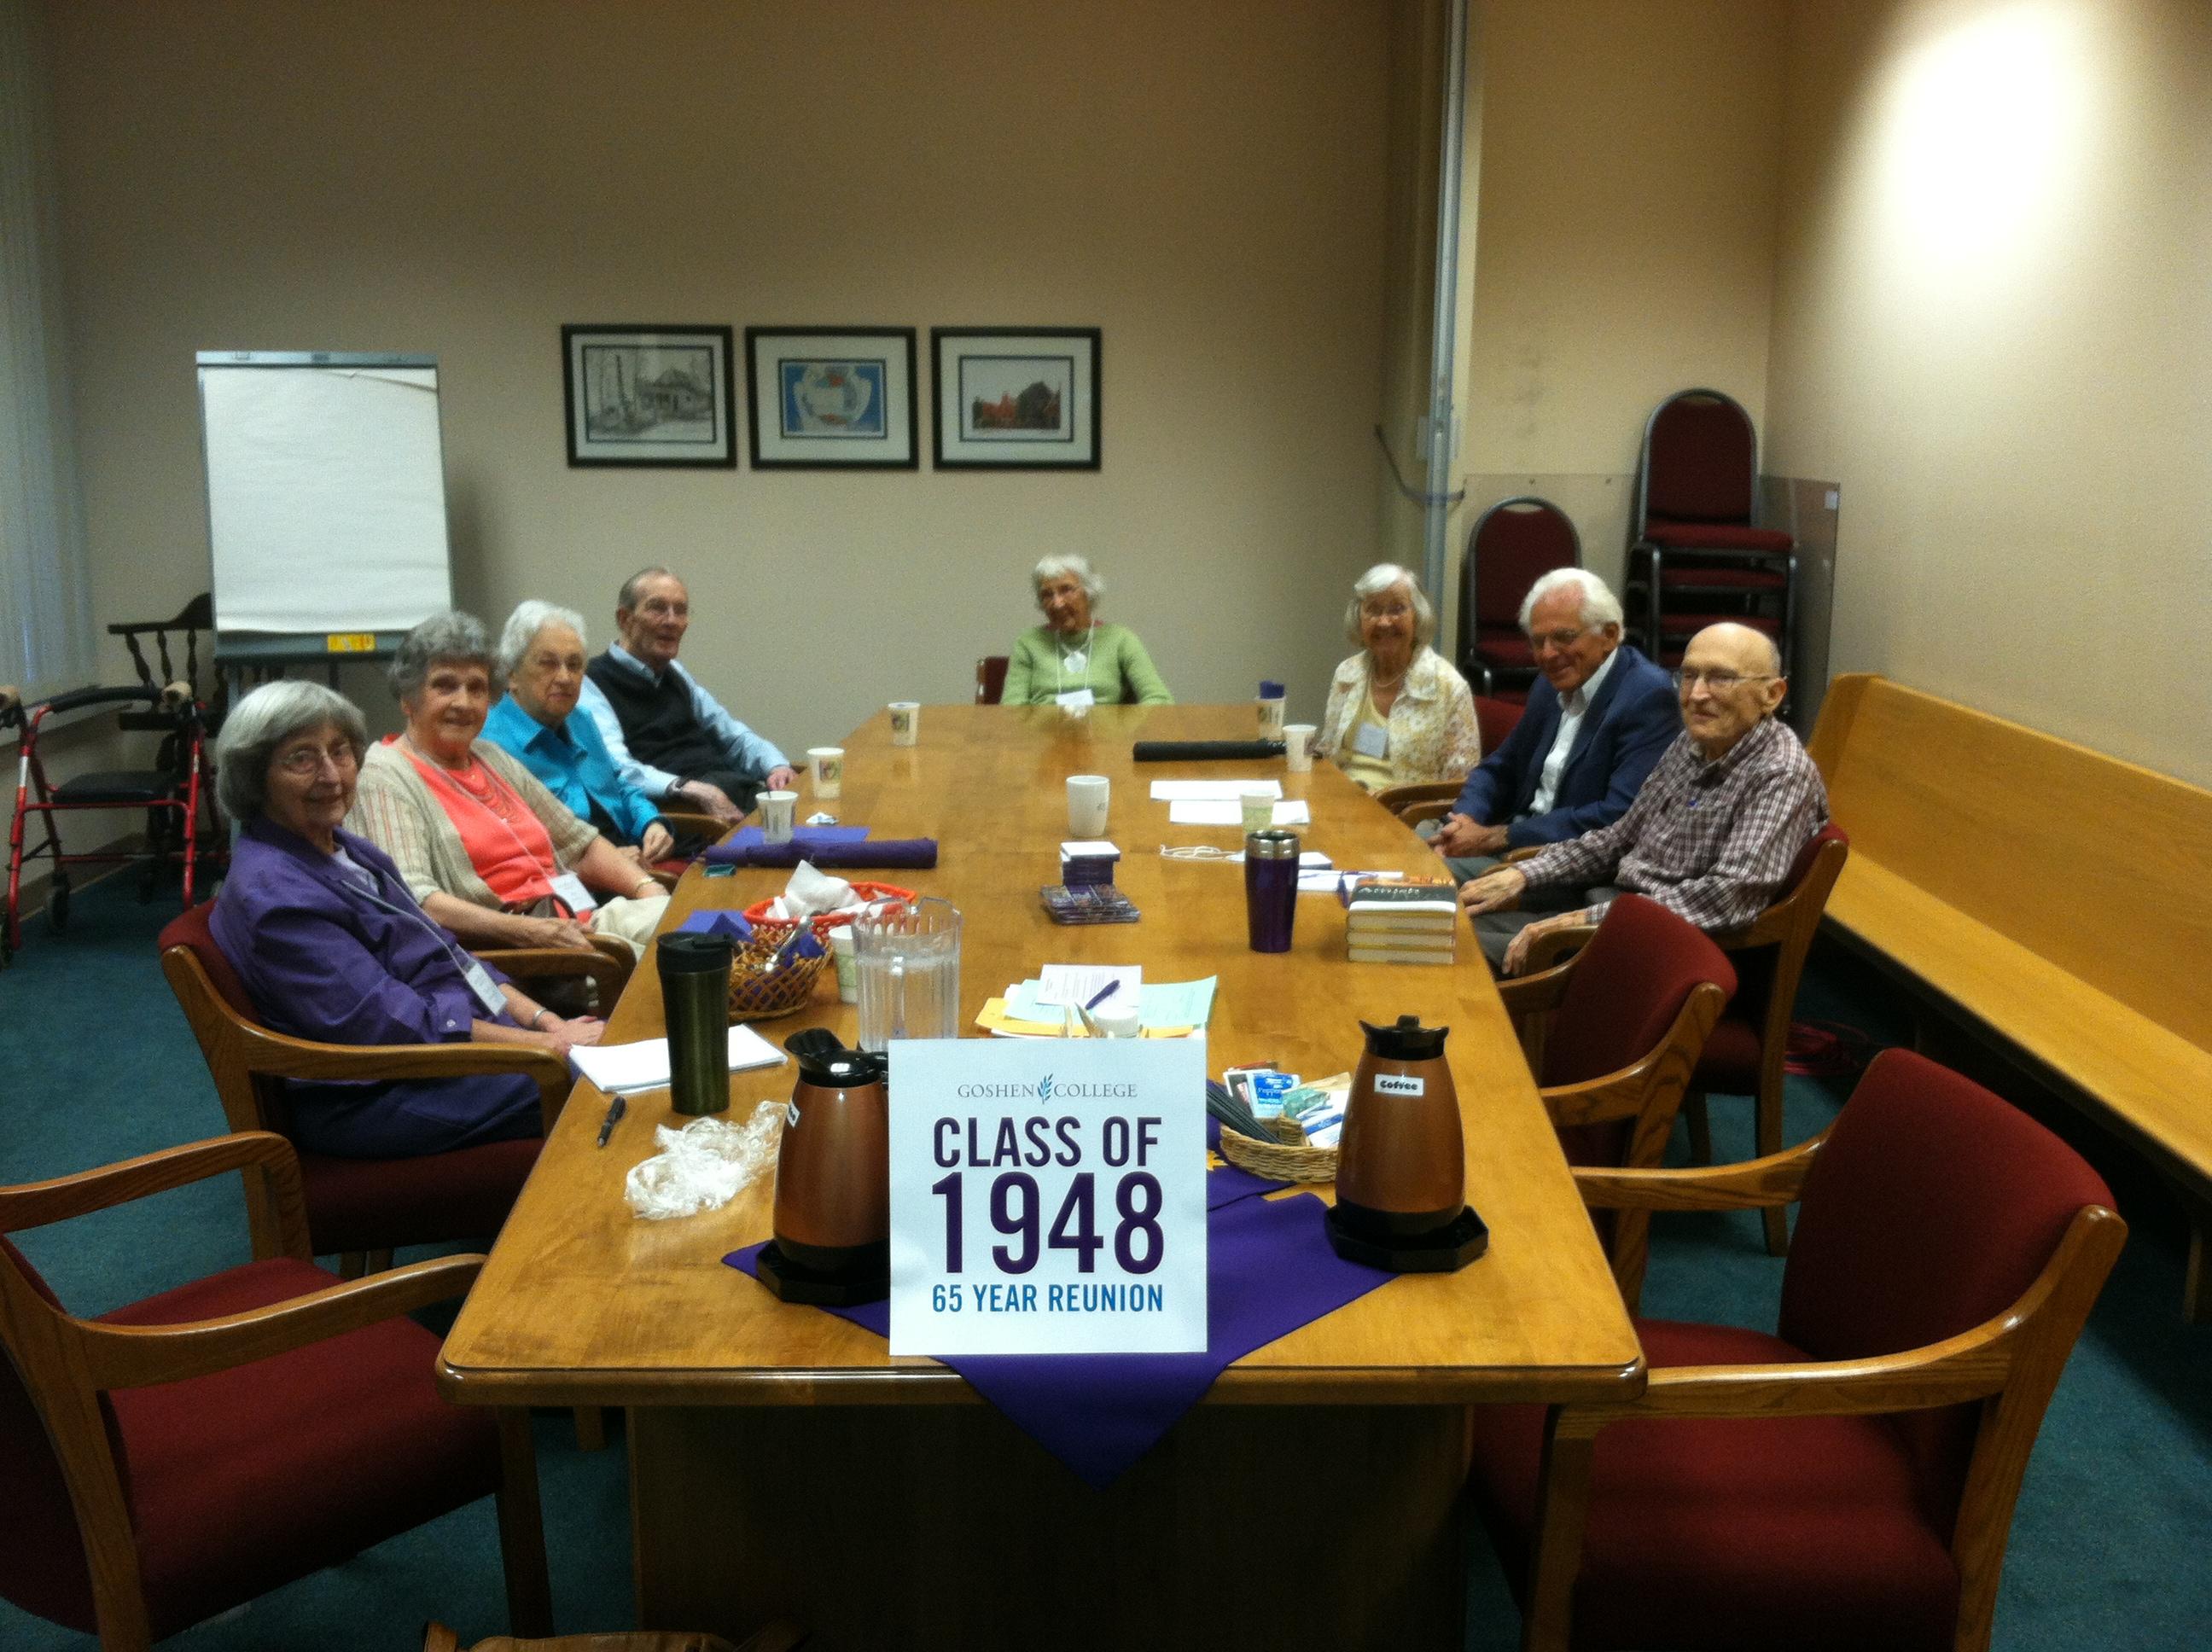 class of '48